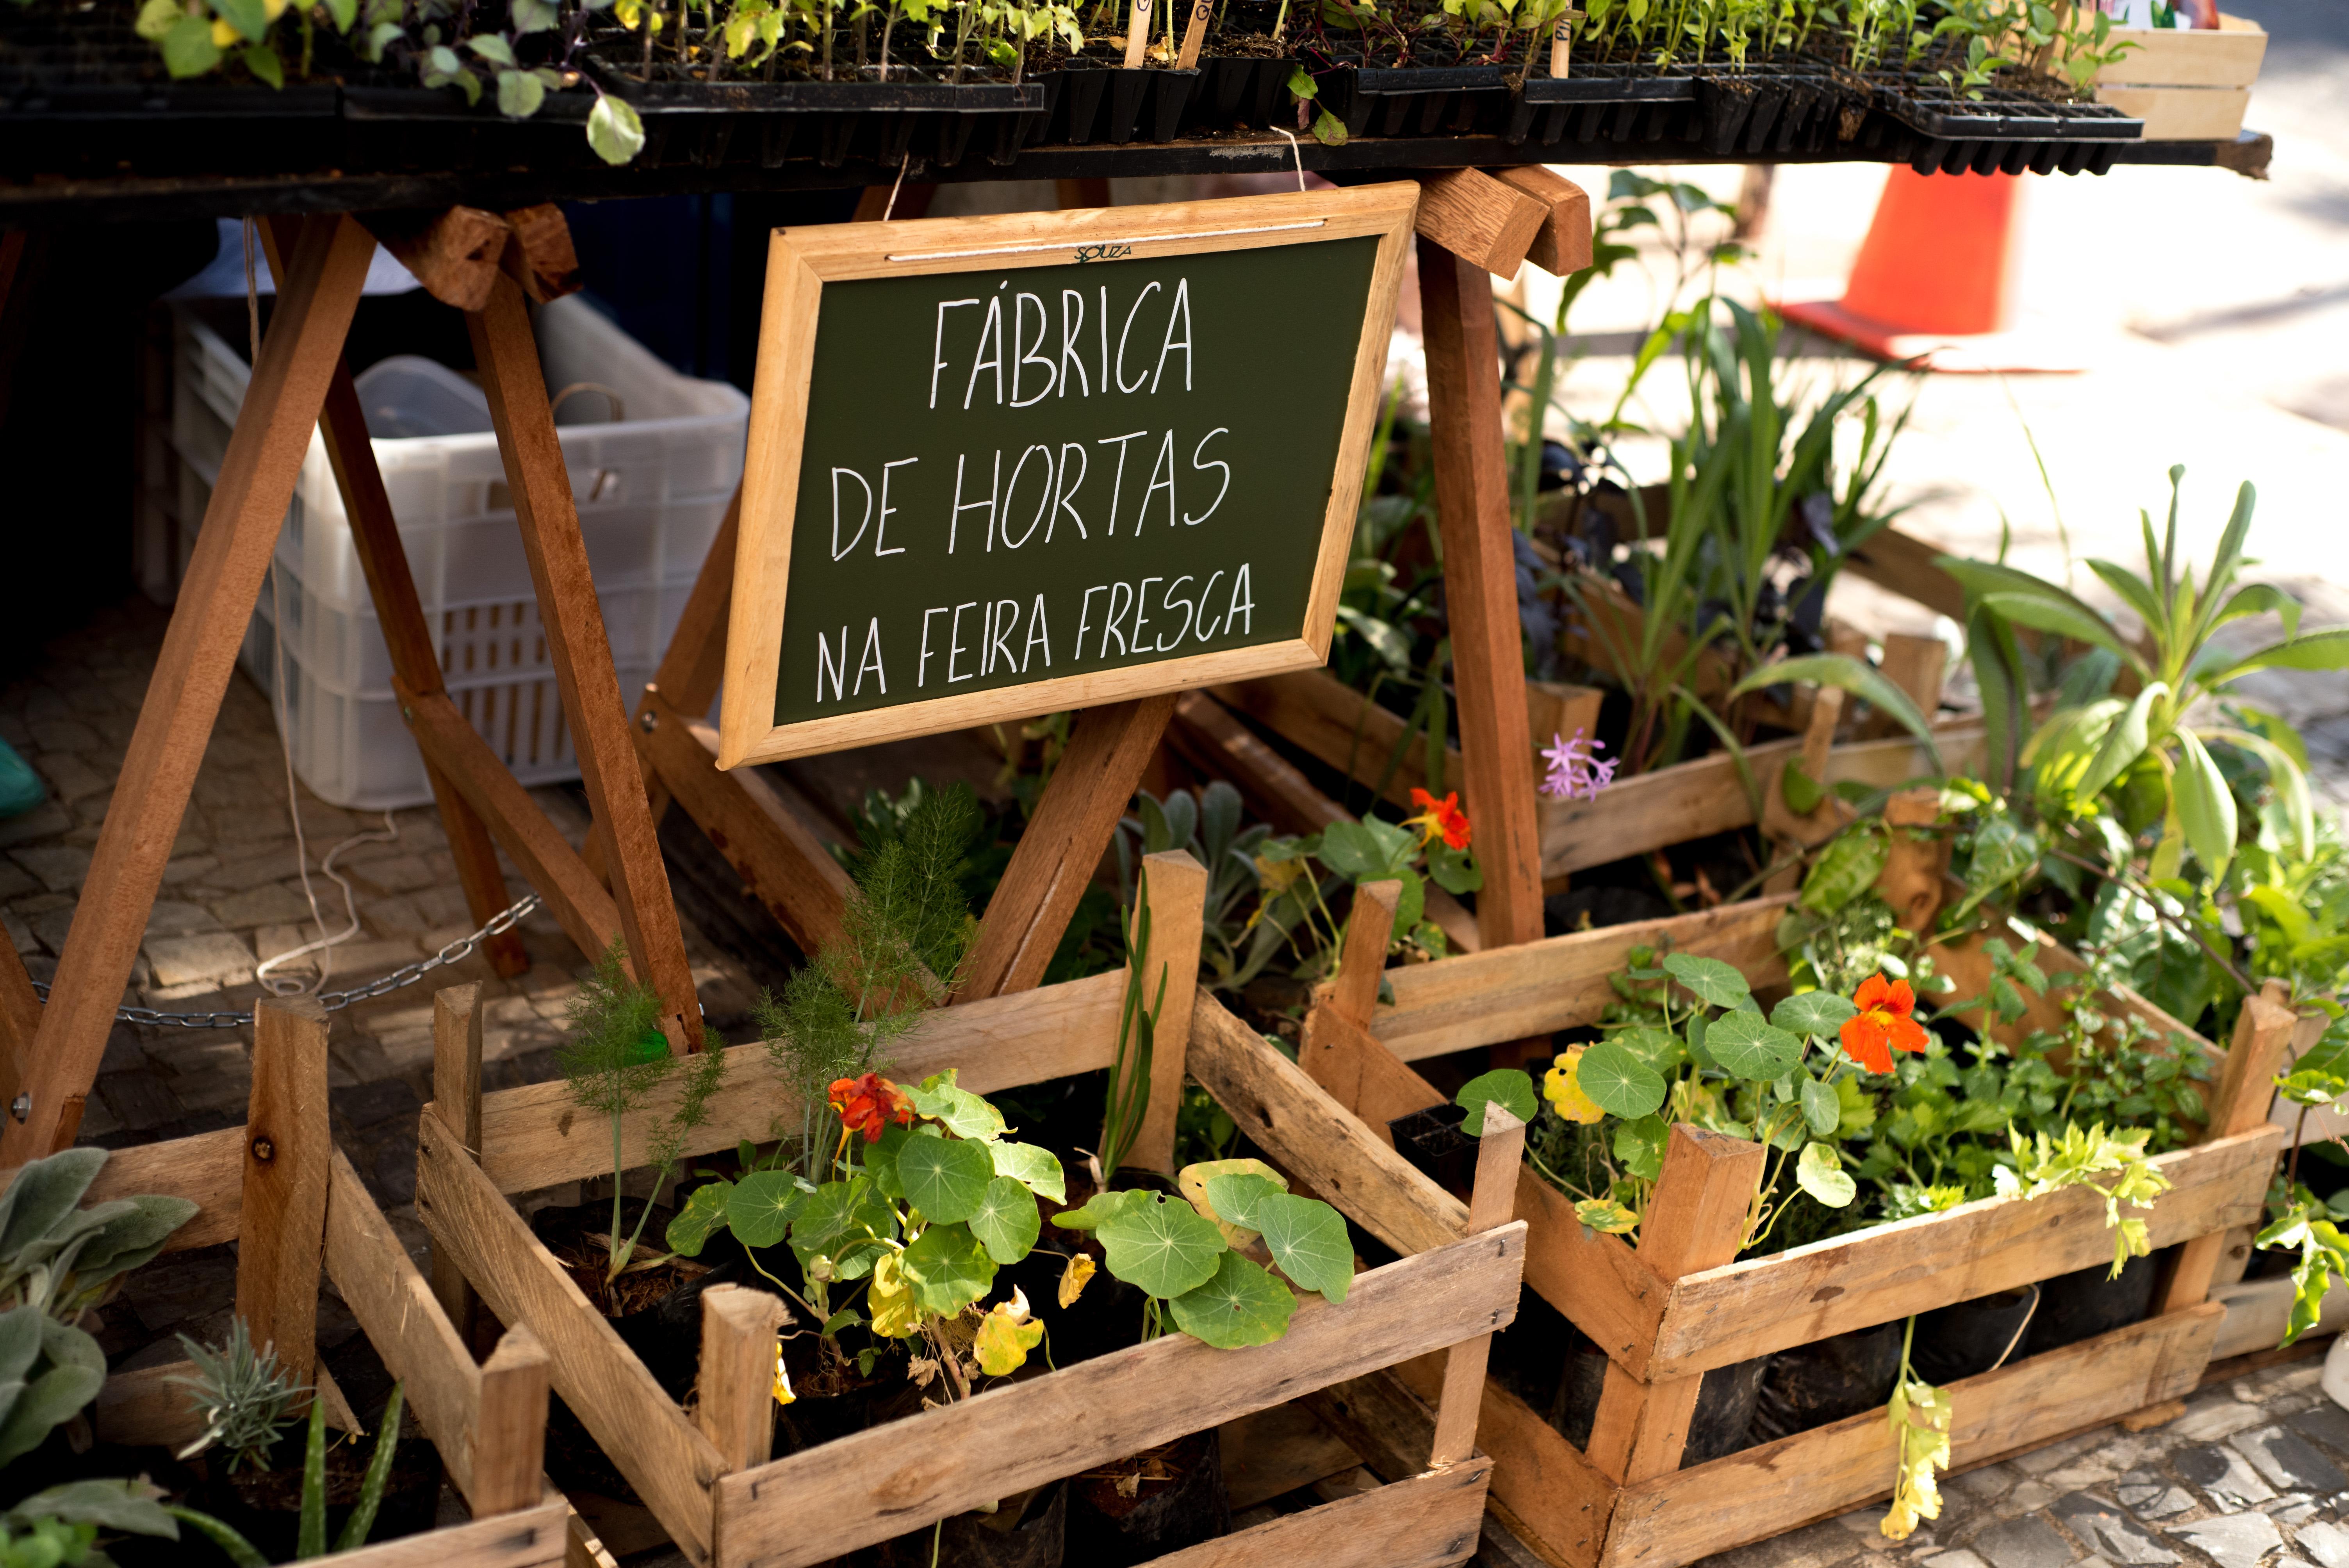 Fábrica de Hortas na Feira Fresca